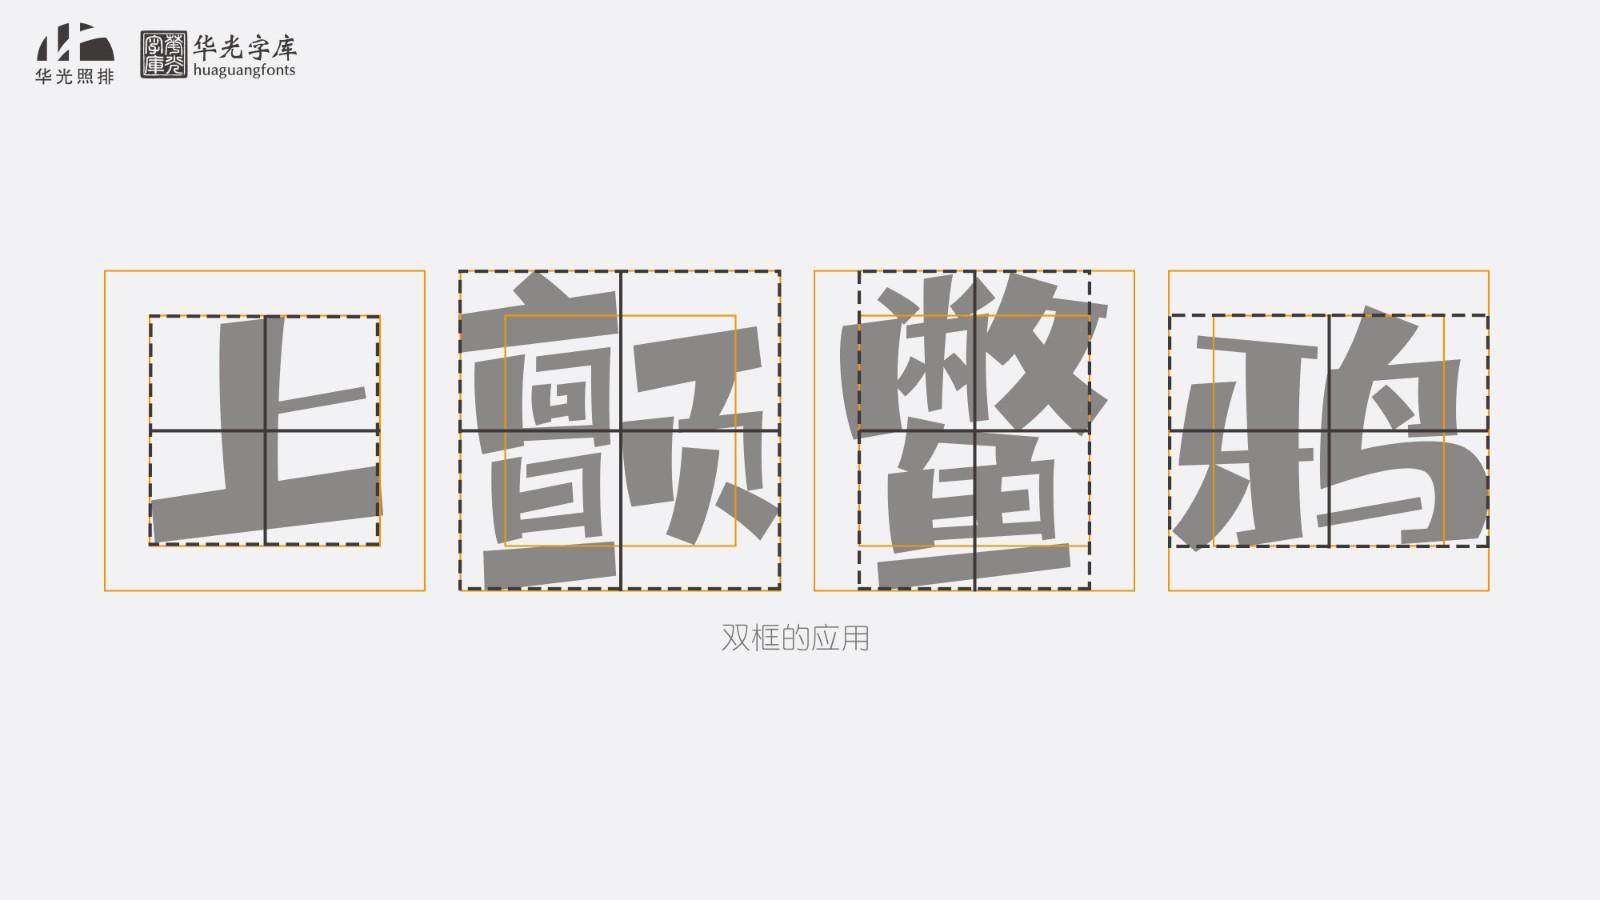 https://ft-bk1.oss-cn-zhangjiakou.aliyuncs.com/Public/Uploads/img/n_content_20201210105958_2439.jpg